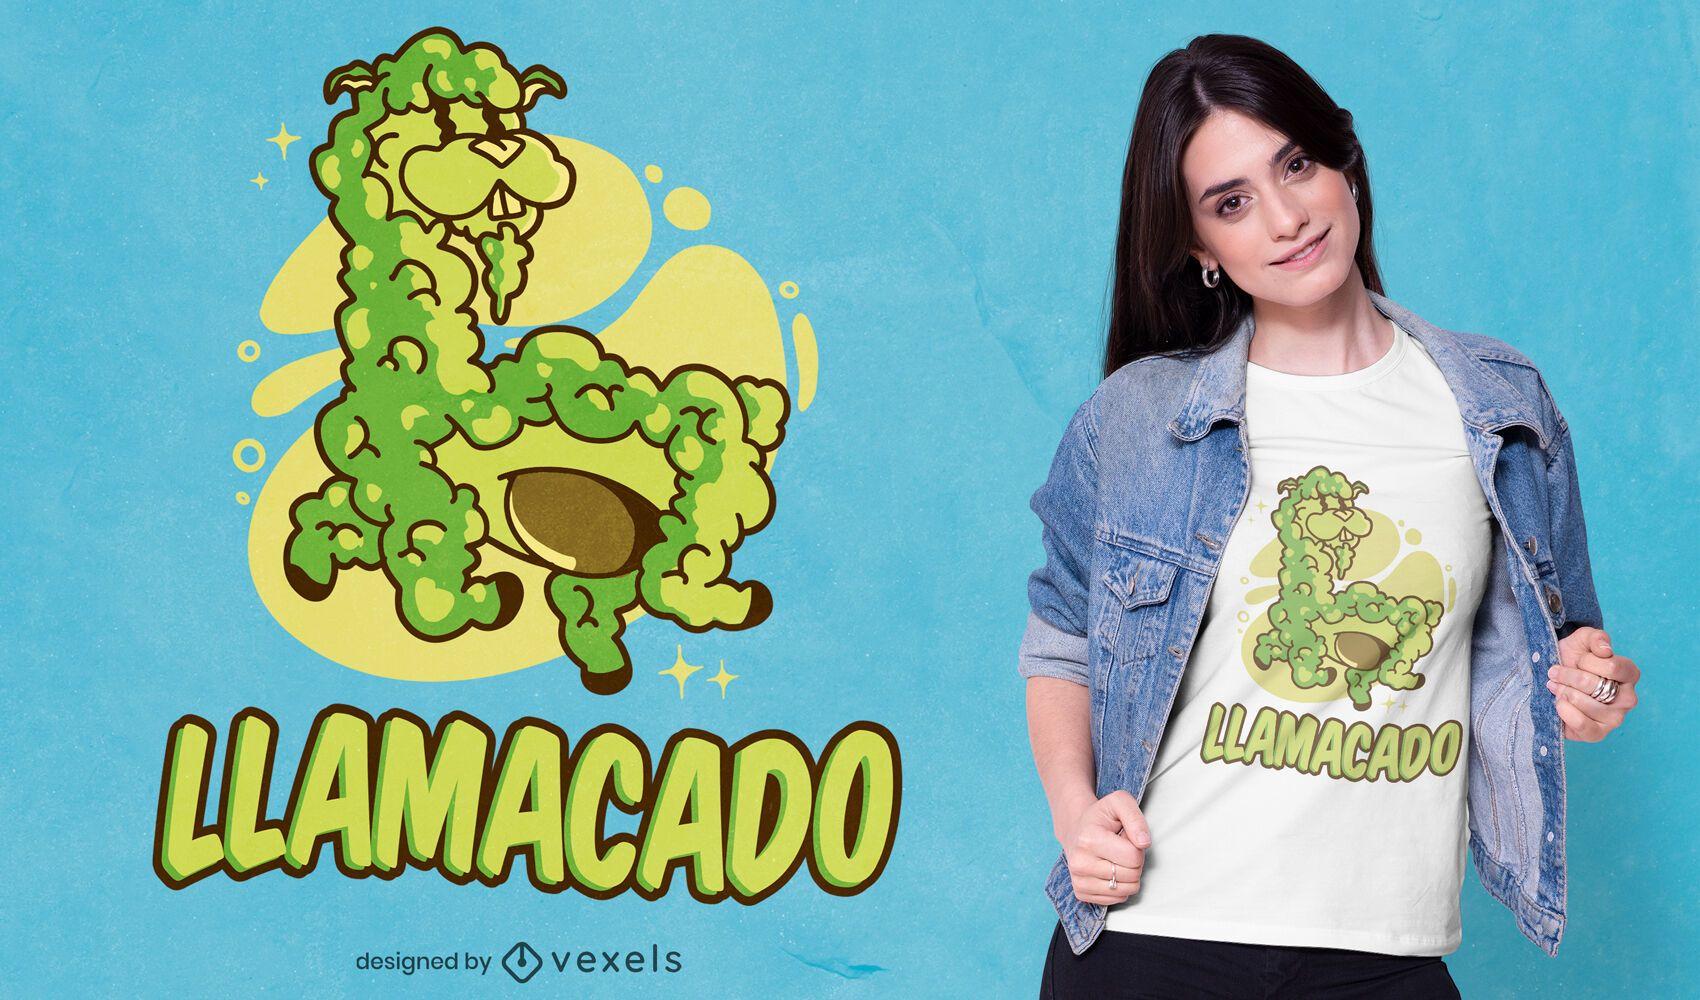 Llamacado t-shirt design